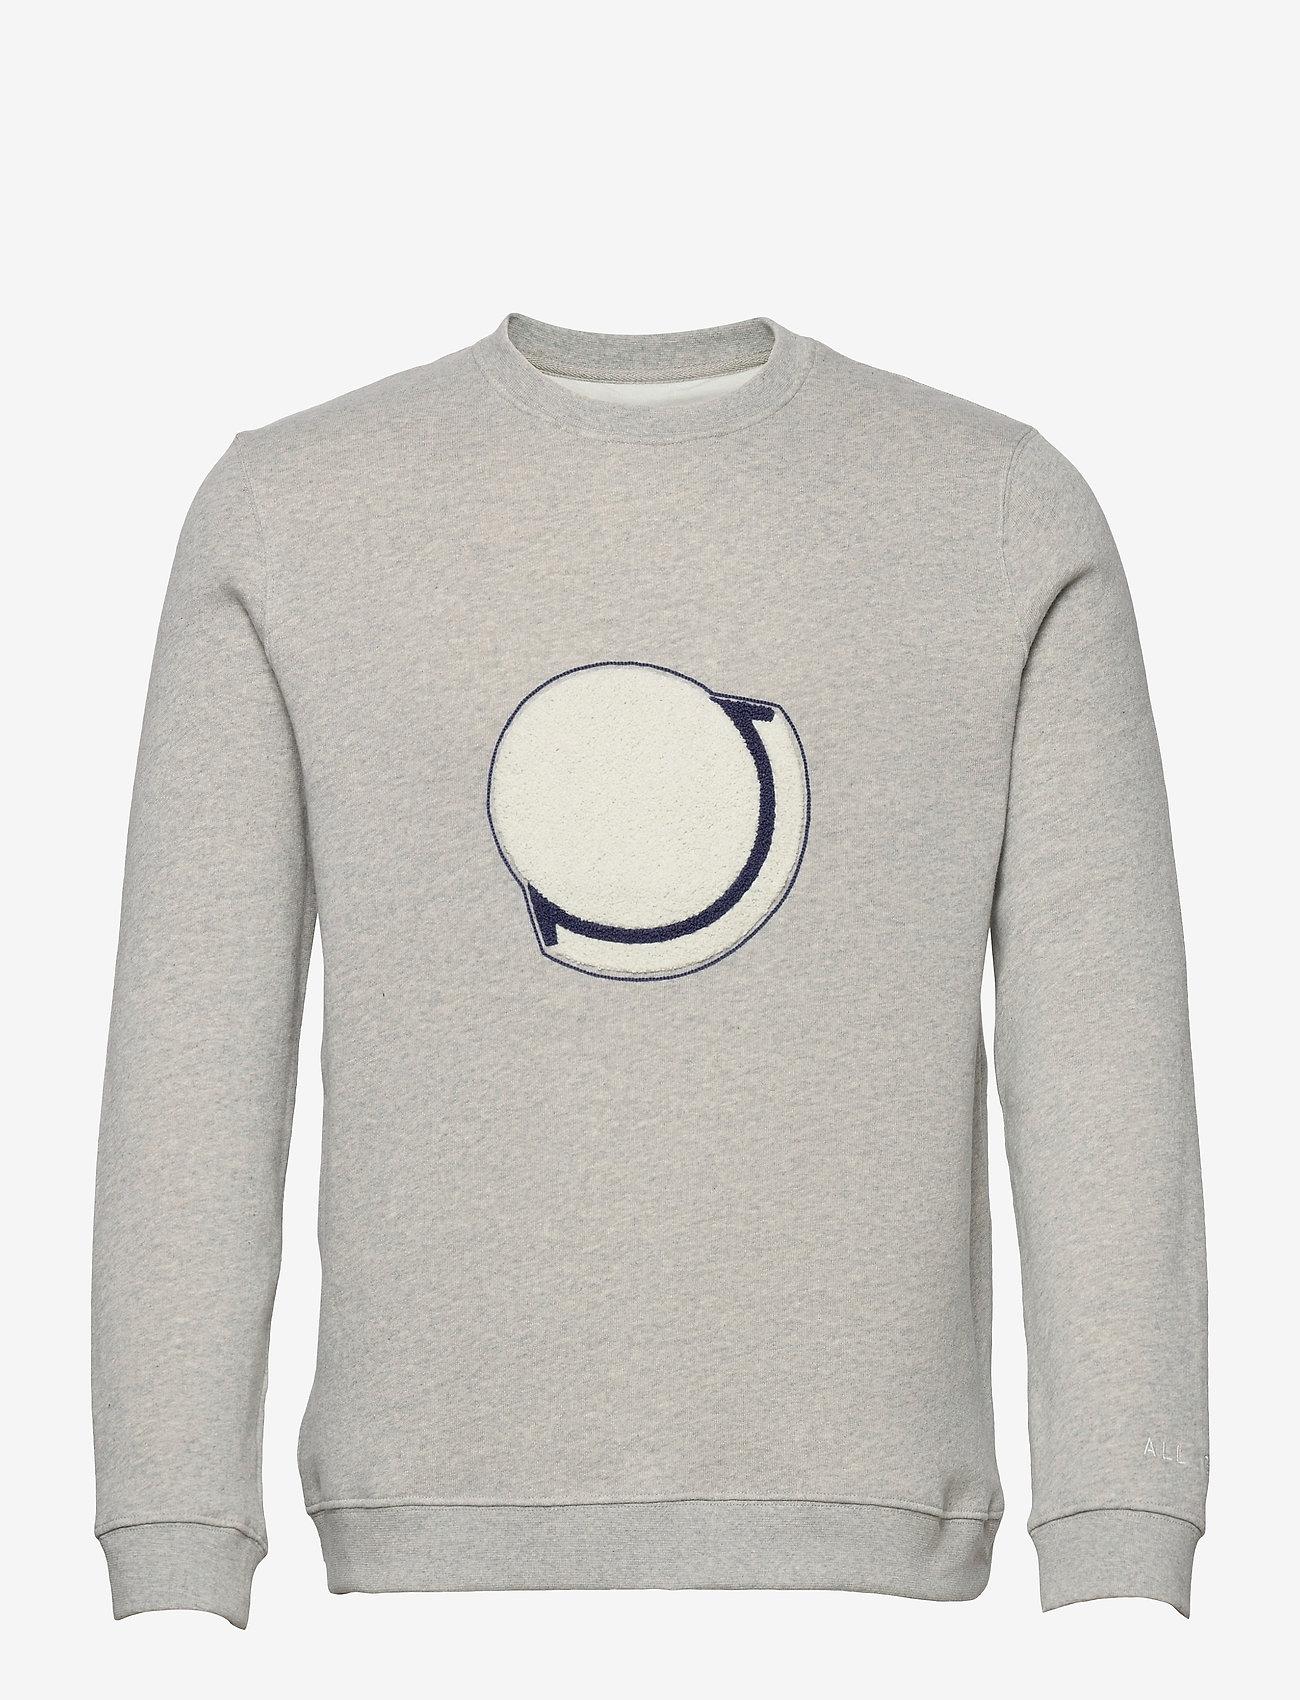 Folk - EMBROIDERED SWEAT - sweats - grey melange - 0